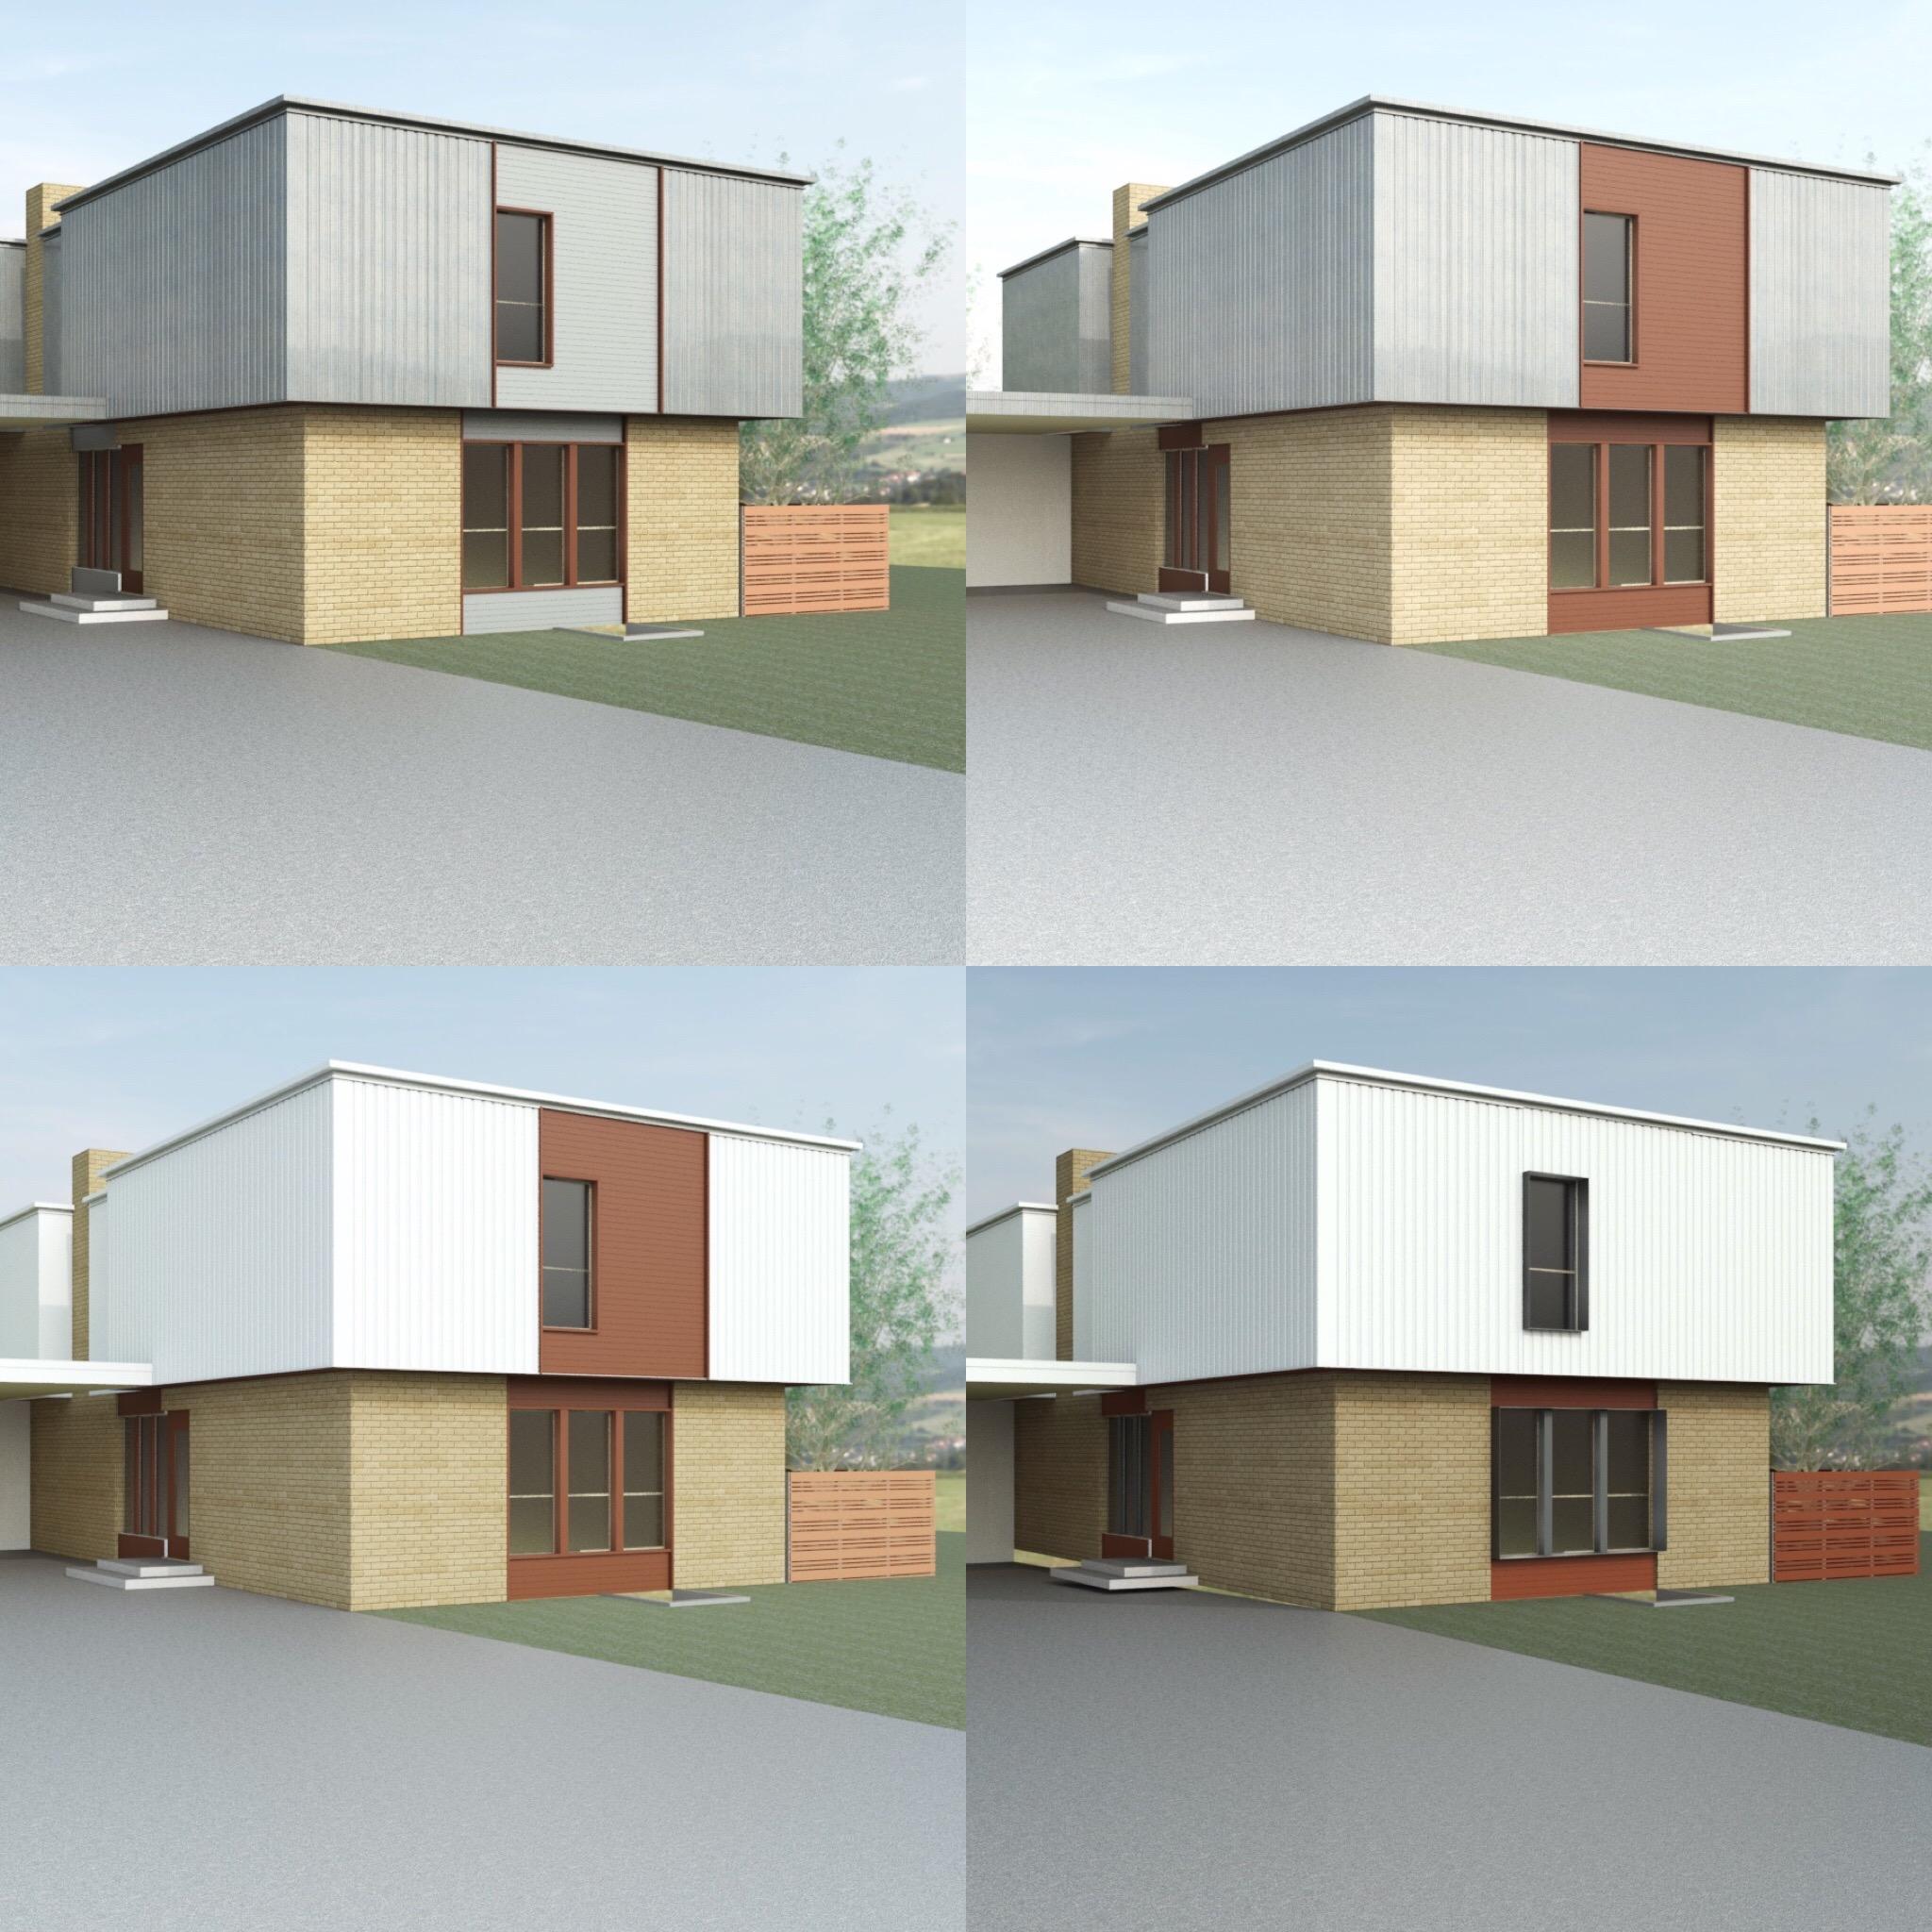 Martins-Exterior-Rendering-Samples.jpg